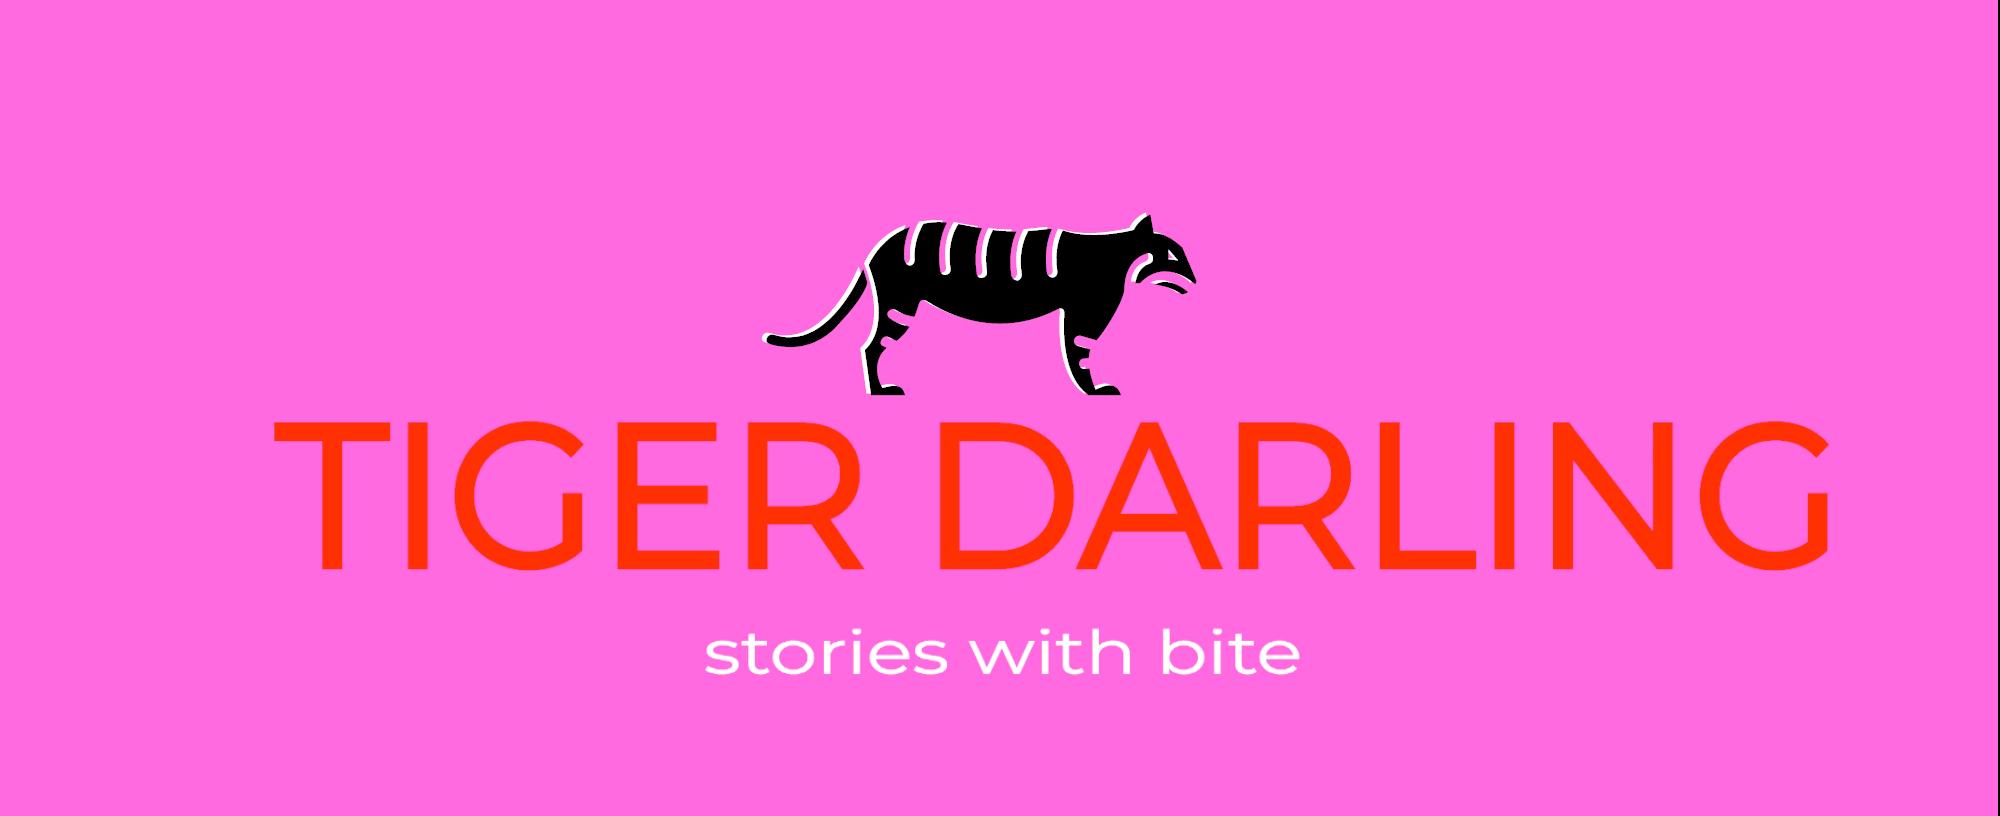 TIGER DARLING-logo pink and red.jpg